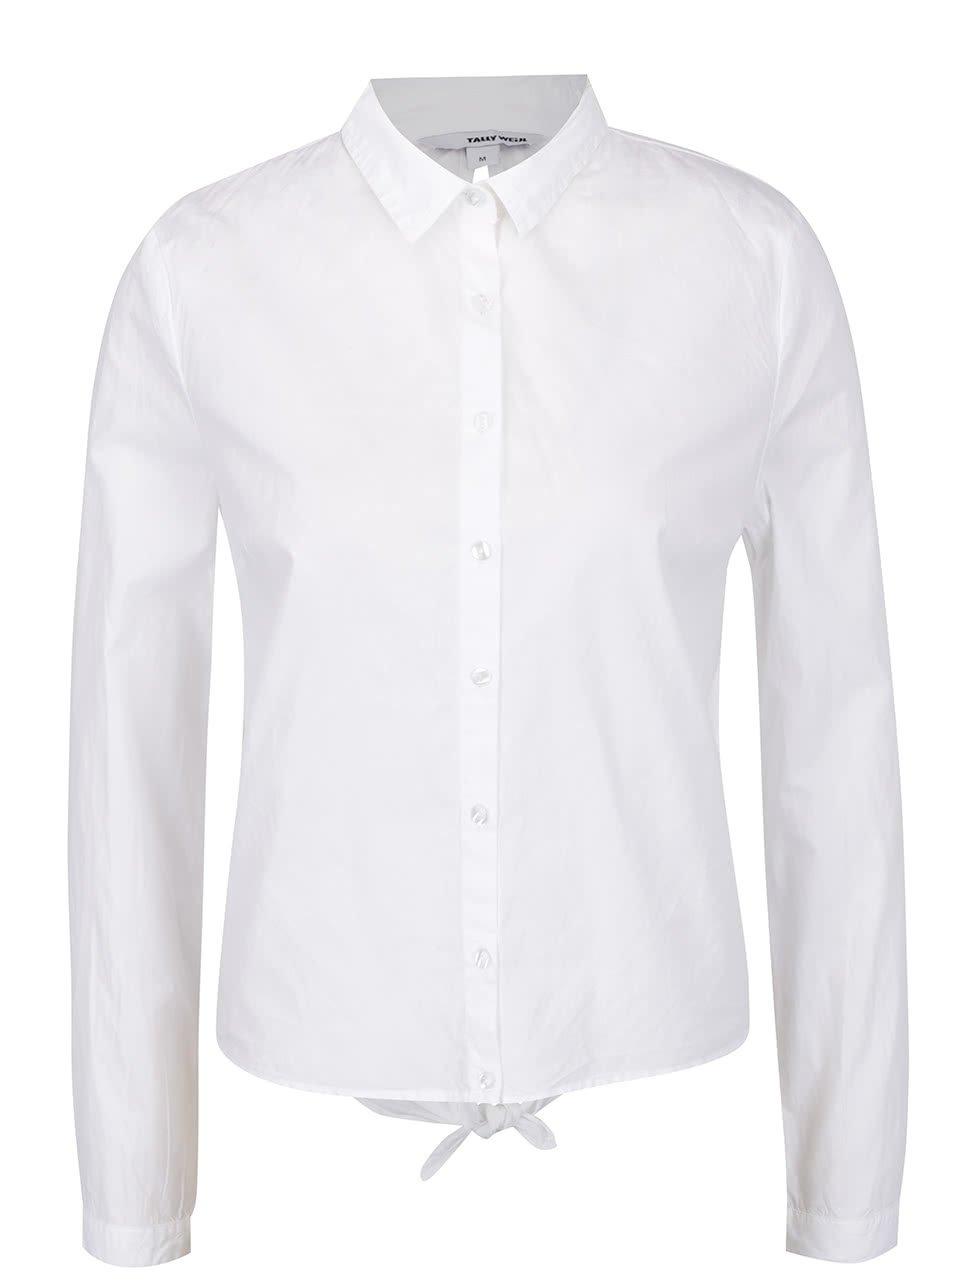 Bílá košile s odhalenými zády TALLY WEiJL